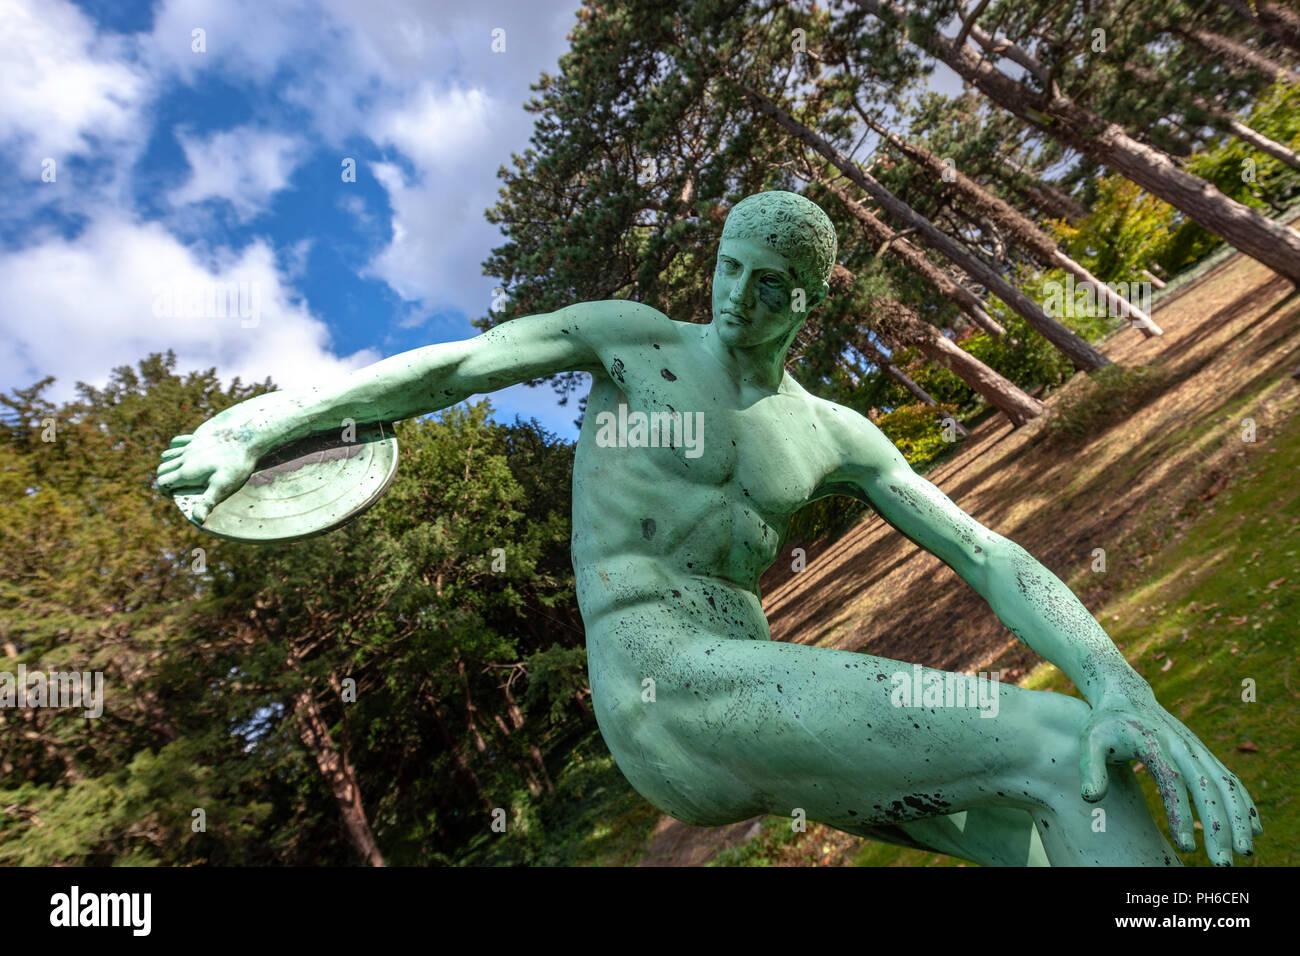 "Bronze copy of Myron of Eleutherae's ""Discobolus"" (discus thrower) in University of Copenhagen Botanical Garden, Copenhagen, Denmark. Stock Photo"